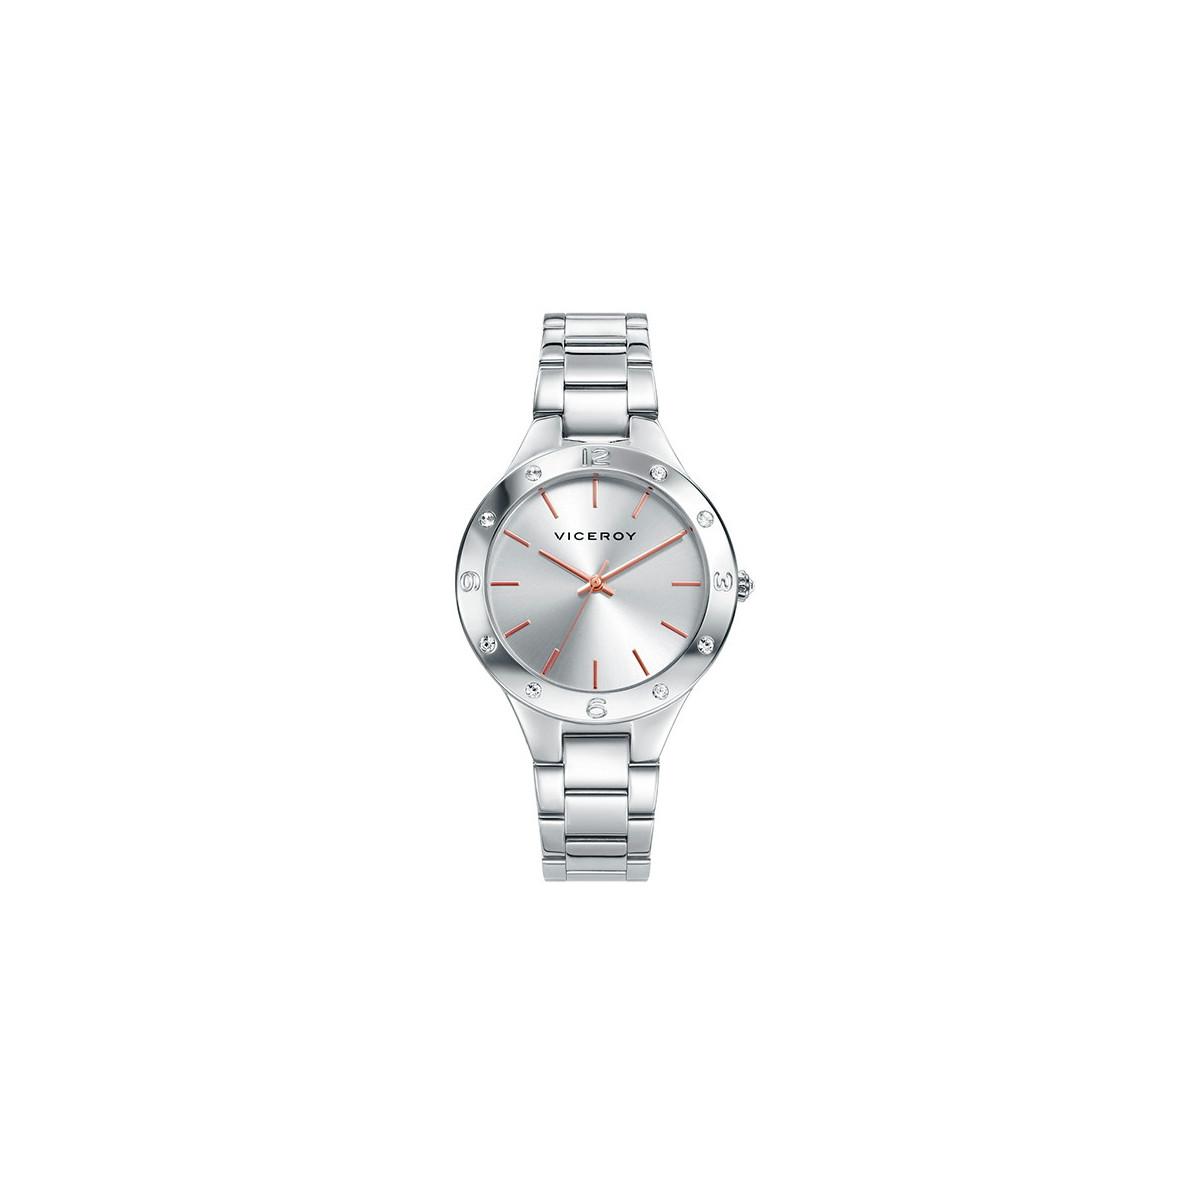 Reloj Viceroy Chic Plateado 401044-87